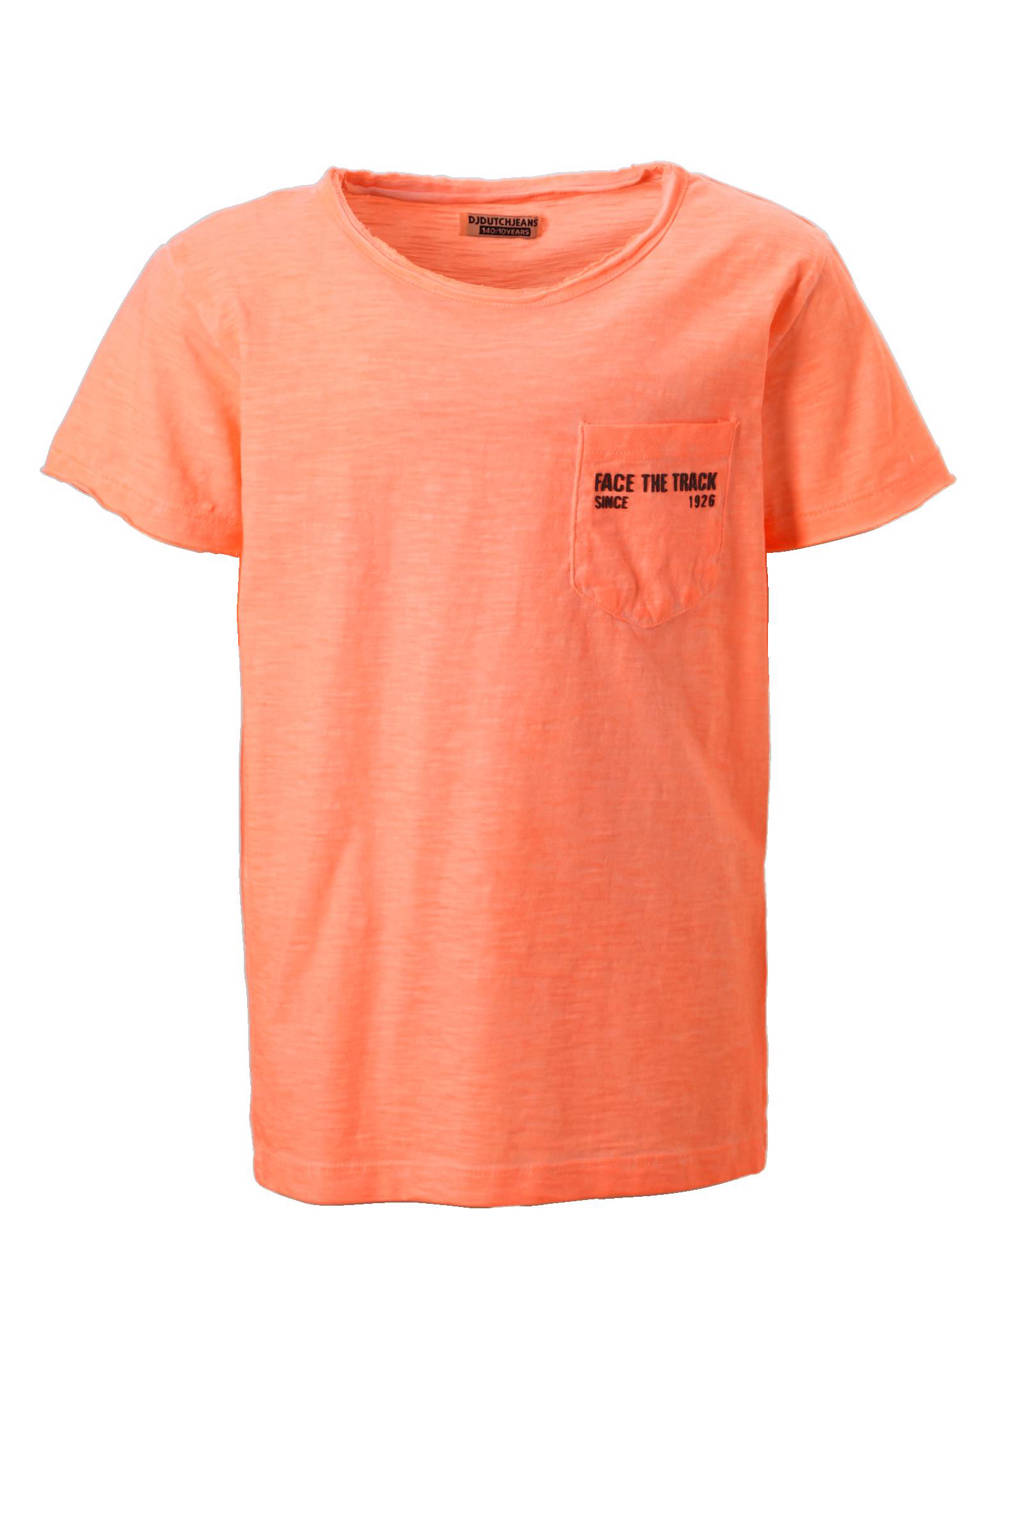 DJ Dutchjeans T-shirt, Oranje / zwart